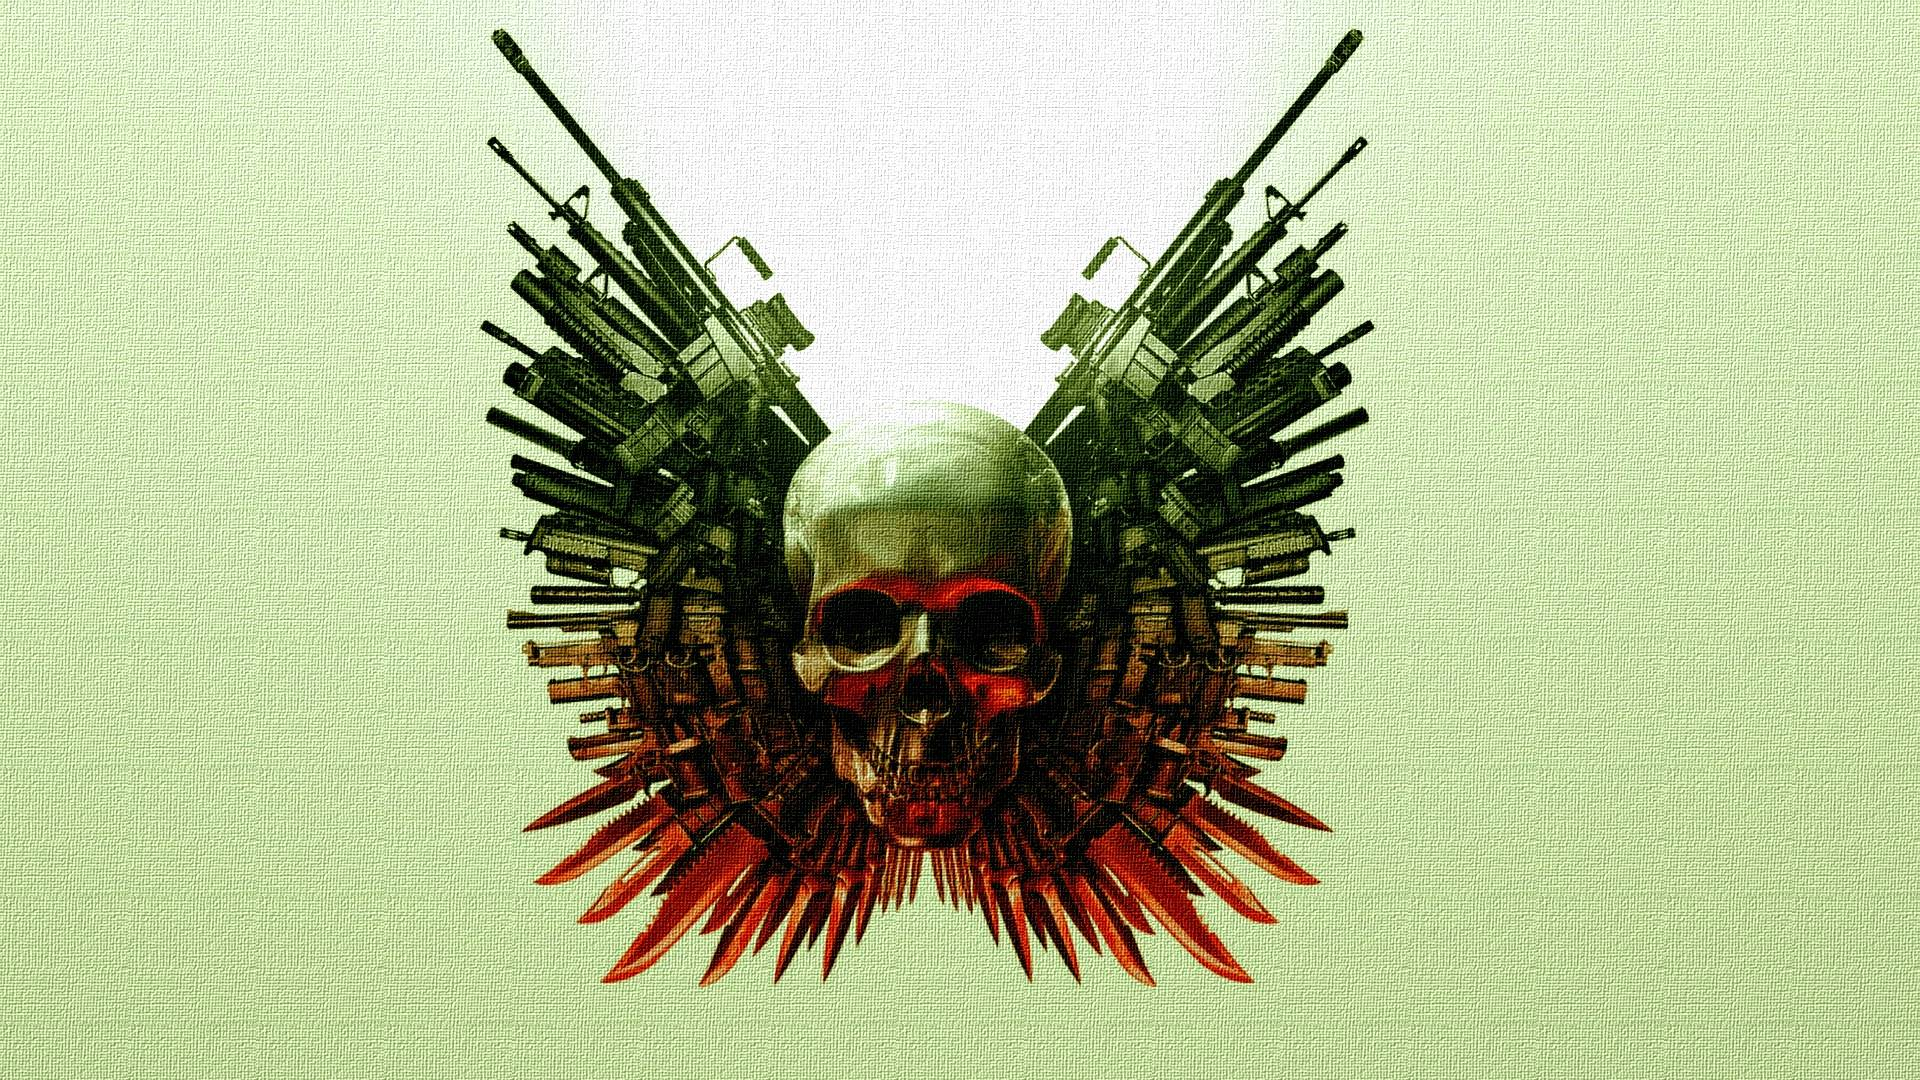 Skulls And Guns Wallpapers 1920x1080